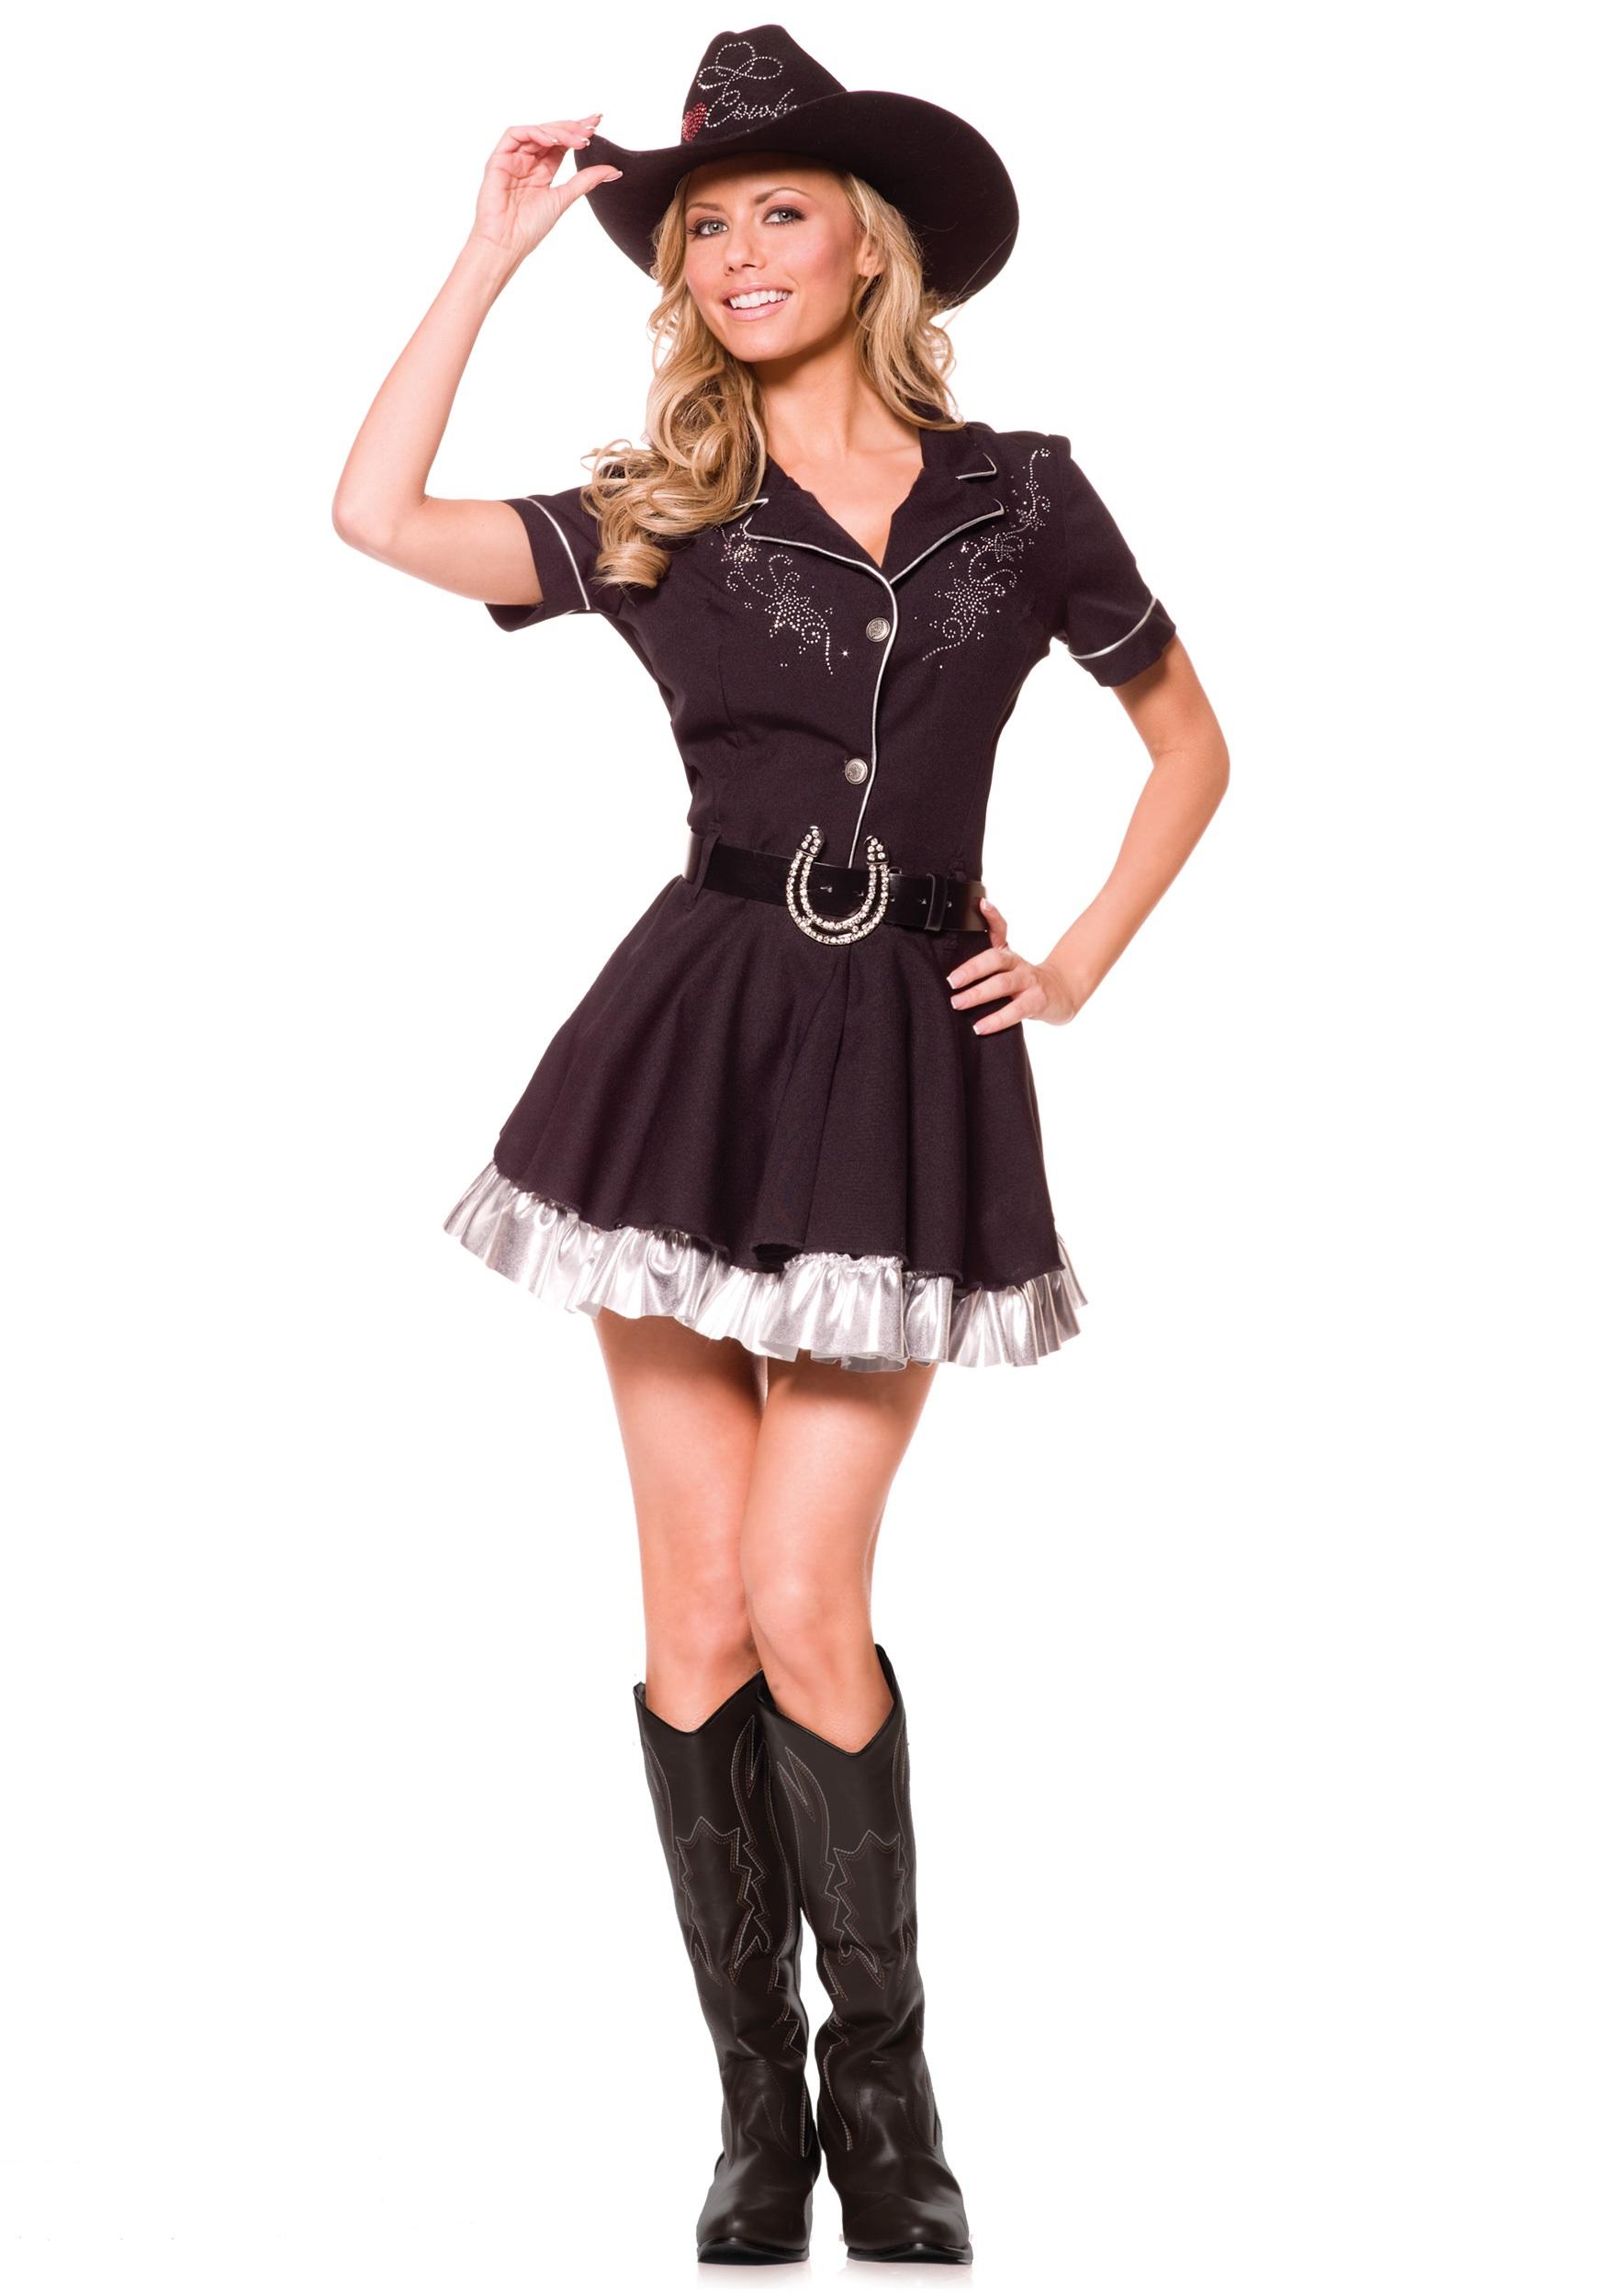 Rhinestone Cowgirl Costume   Country Girl Costume